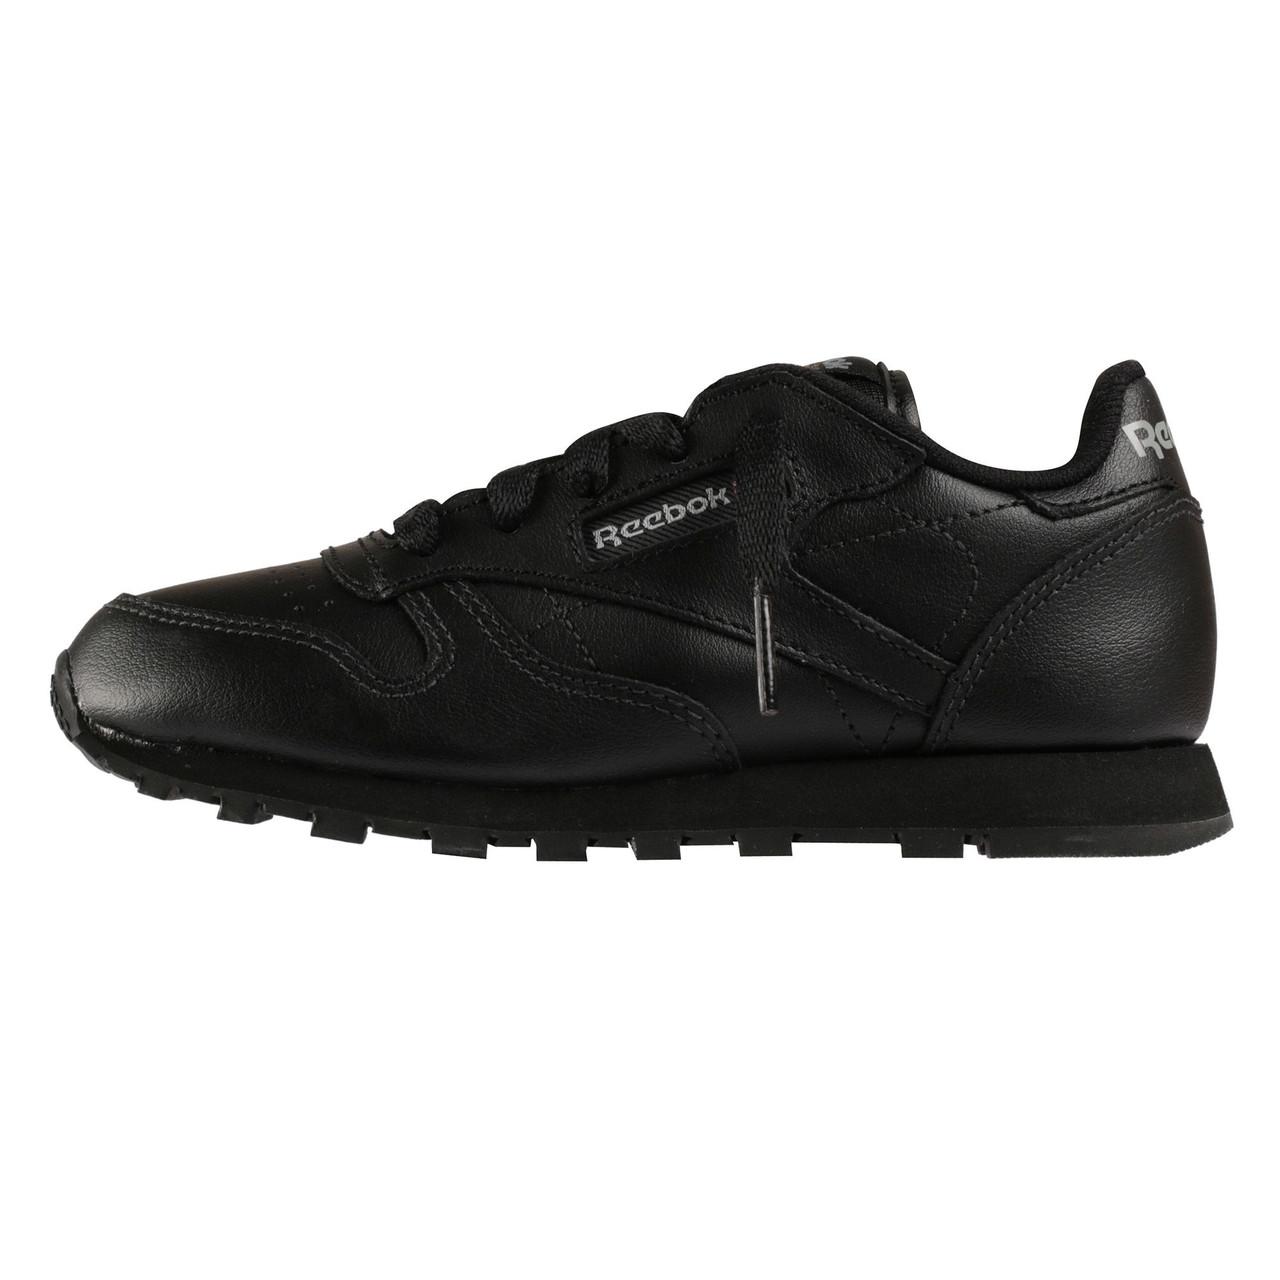 Детские кроссовки Reebok classic leather (Артикул: 50170)